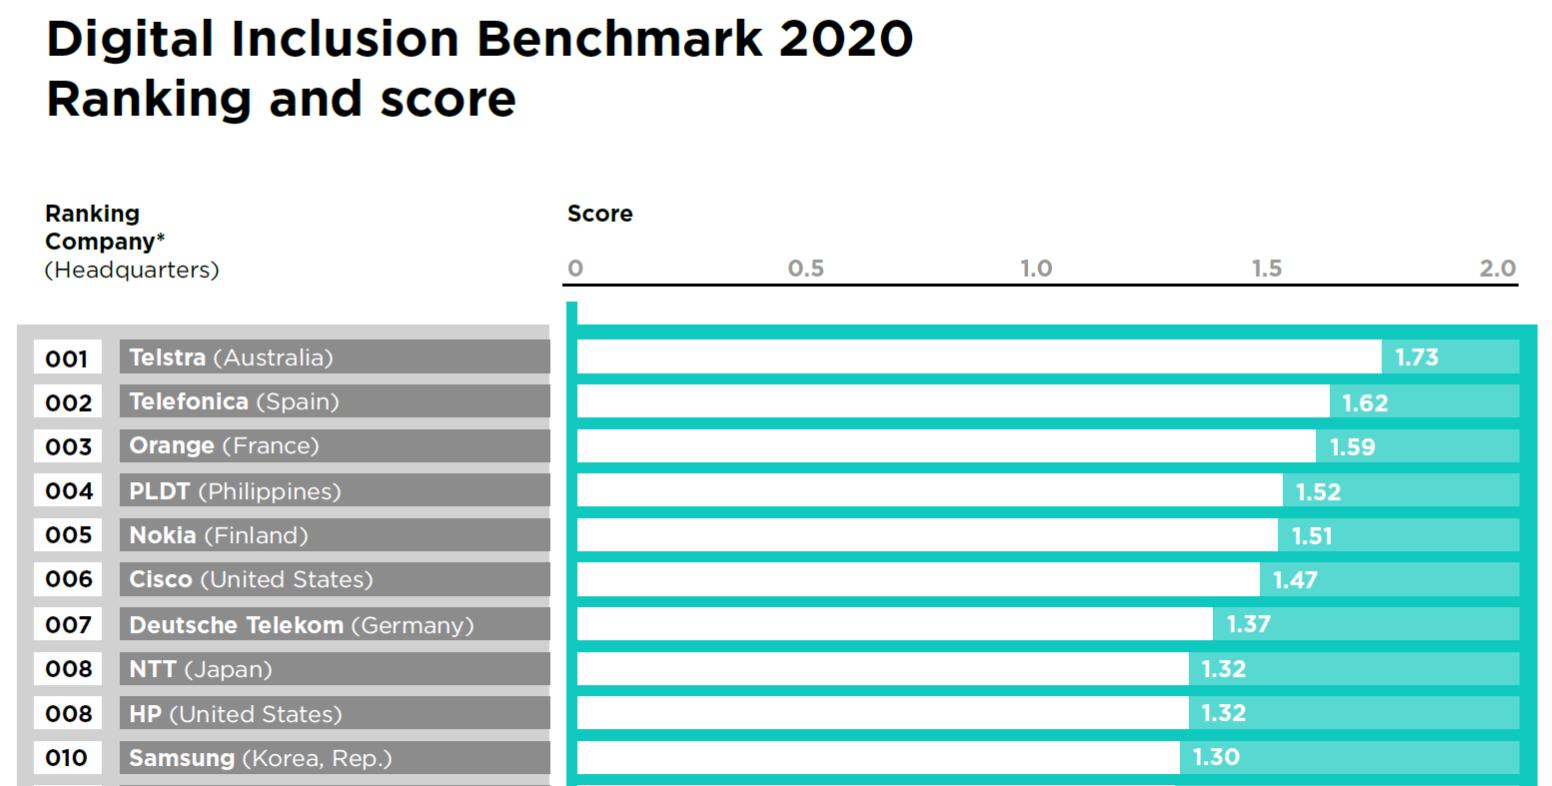 Top 10 companies in digital inclusion